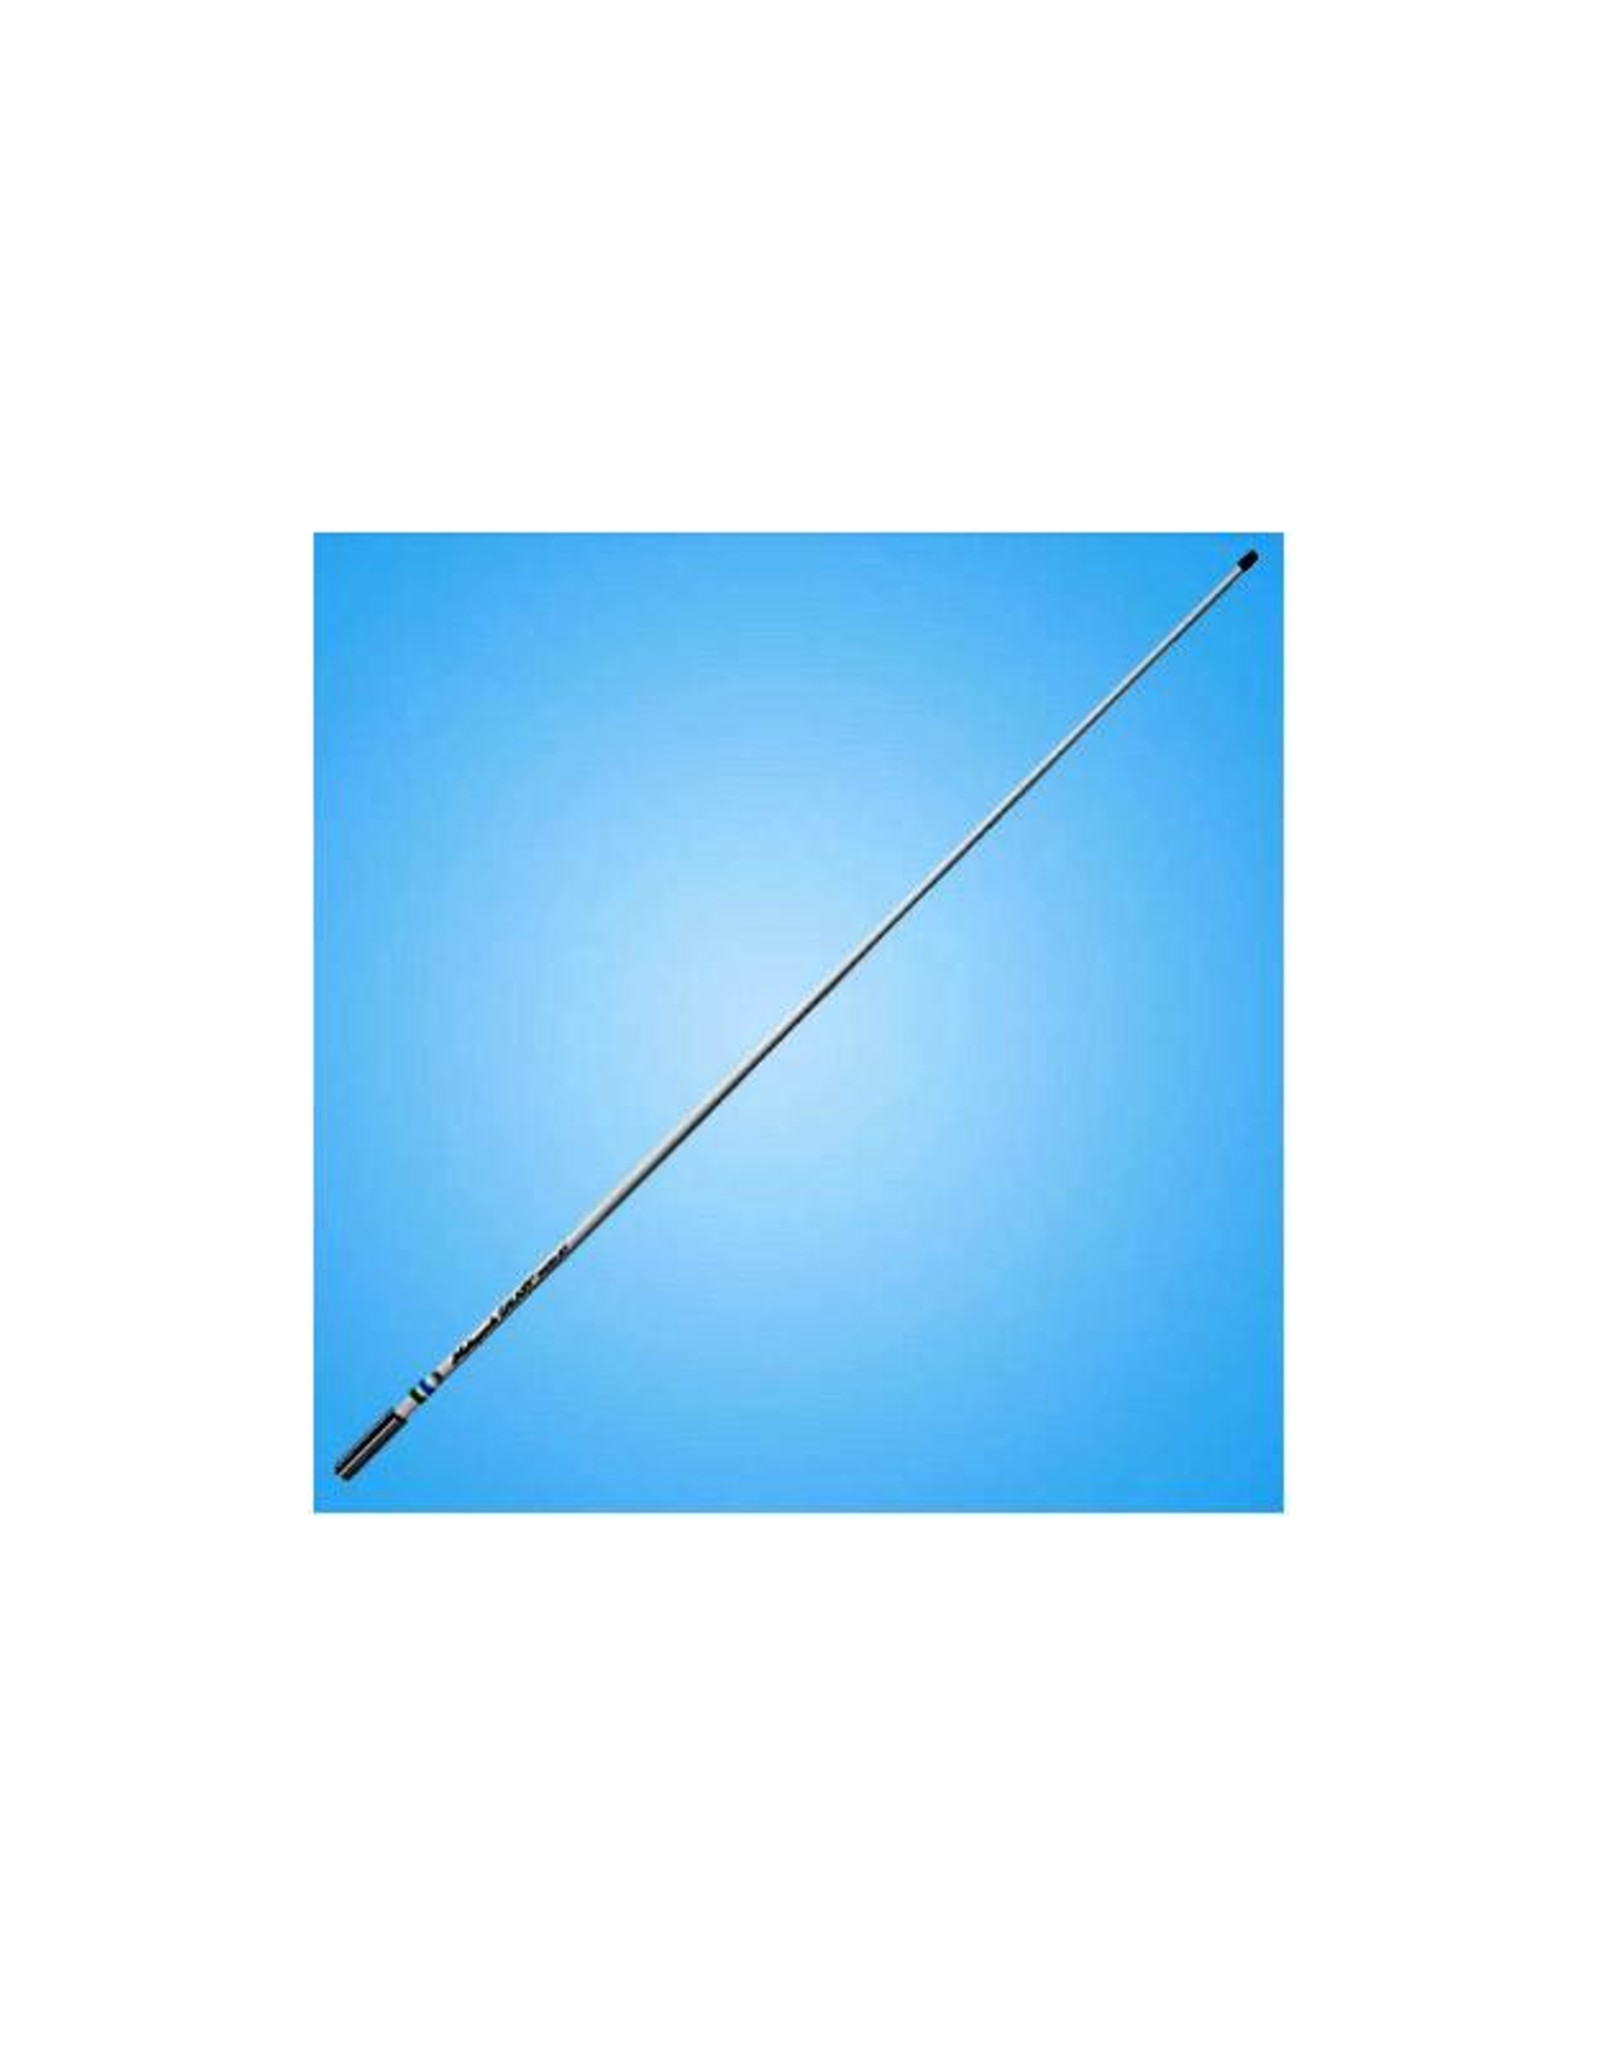 ANTENNA VHF 4' GALAXY 5400-XT